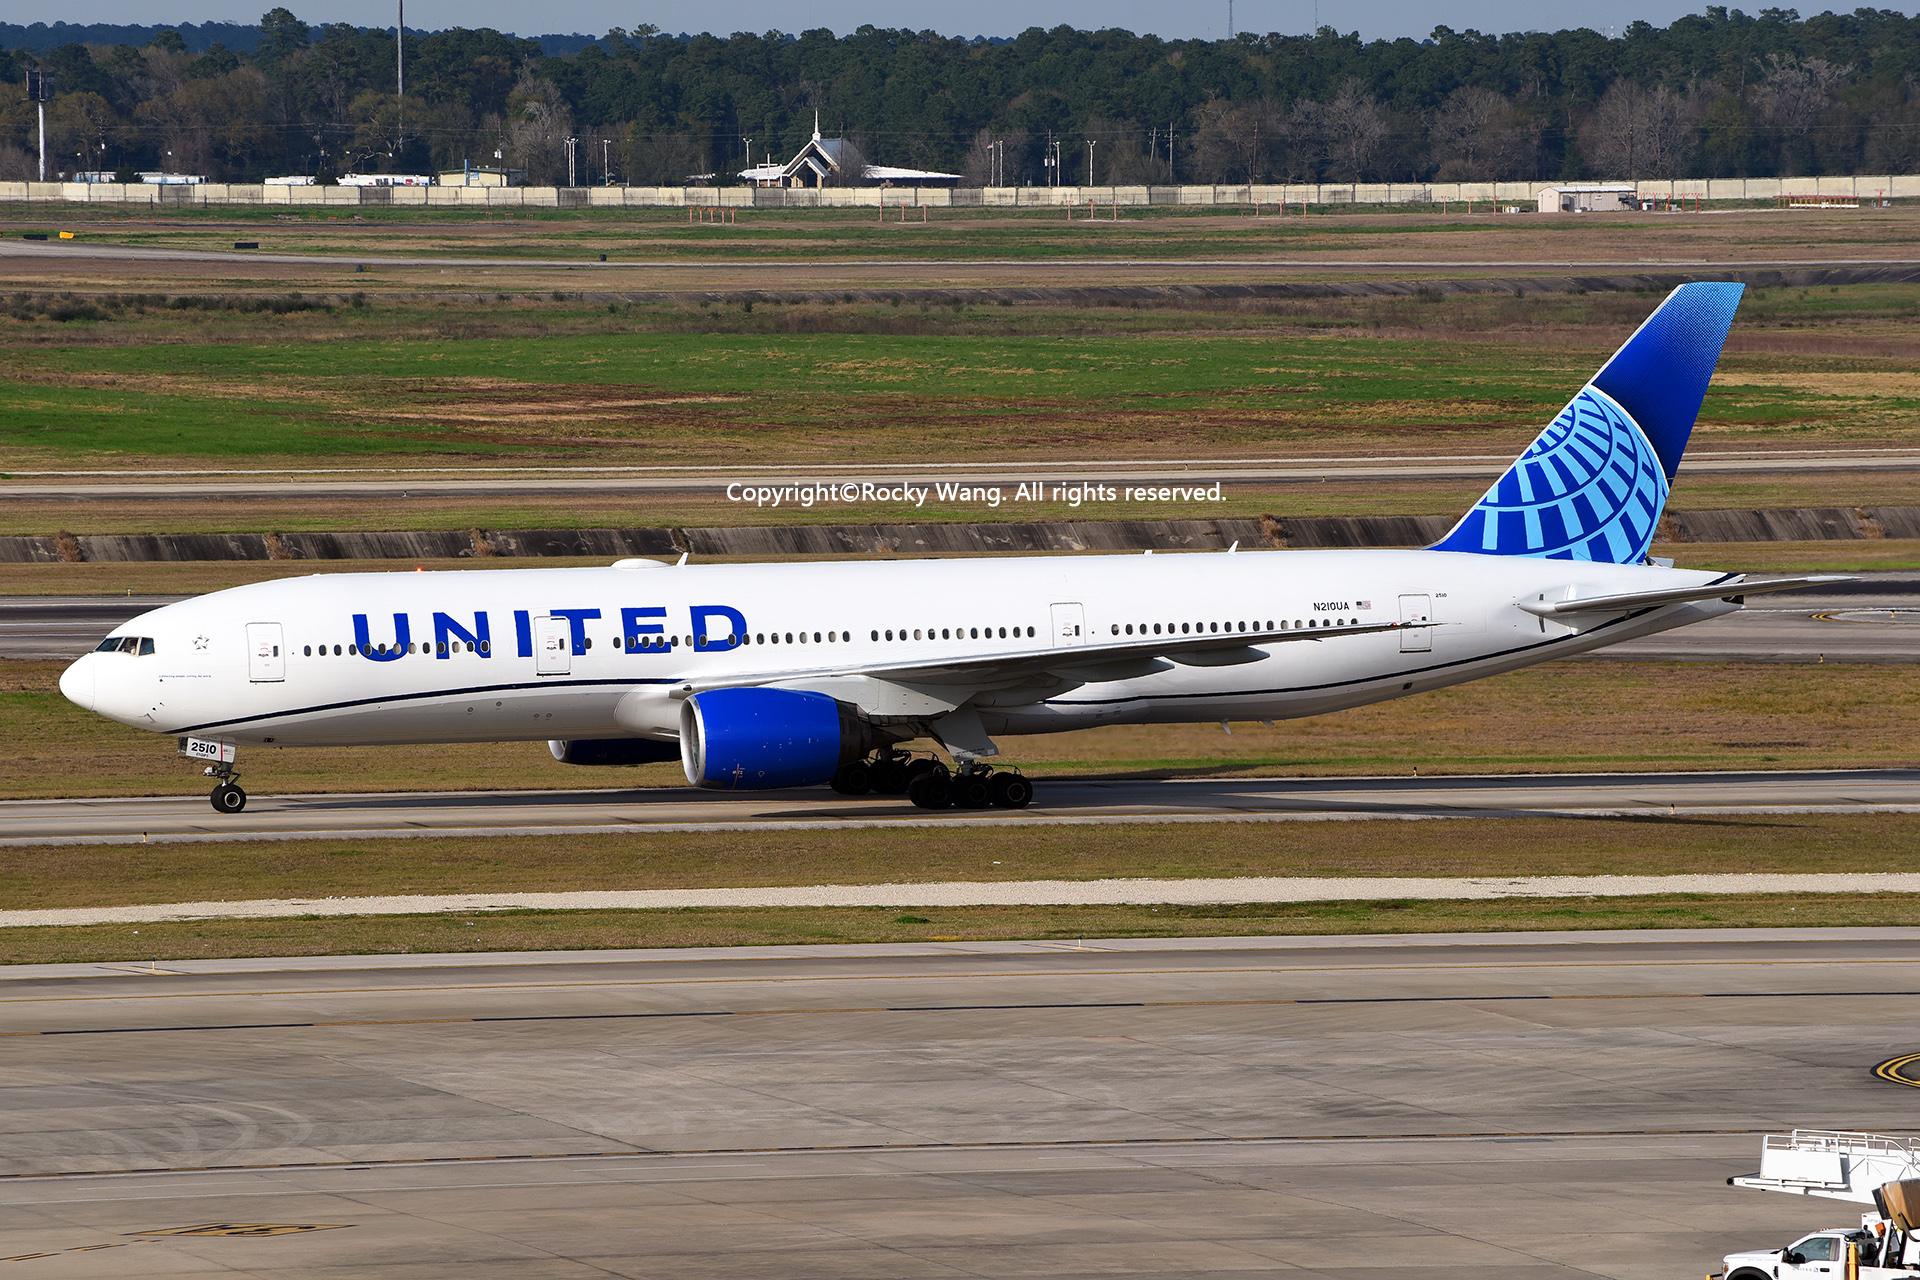 居家了 批量处理老图 倾情奉献52家777 BOEING 777-222 N210UA Houston George Bush Intercontinental Air